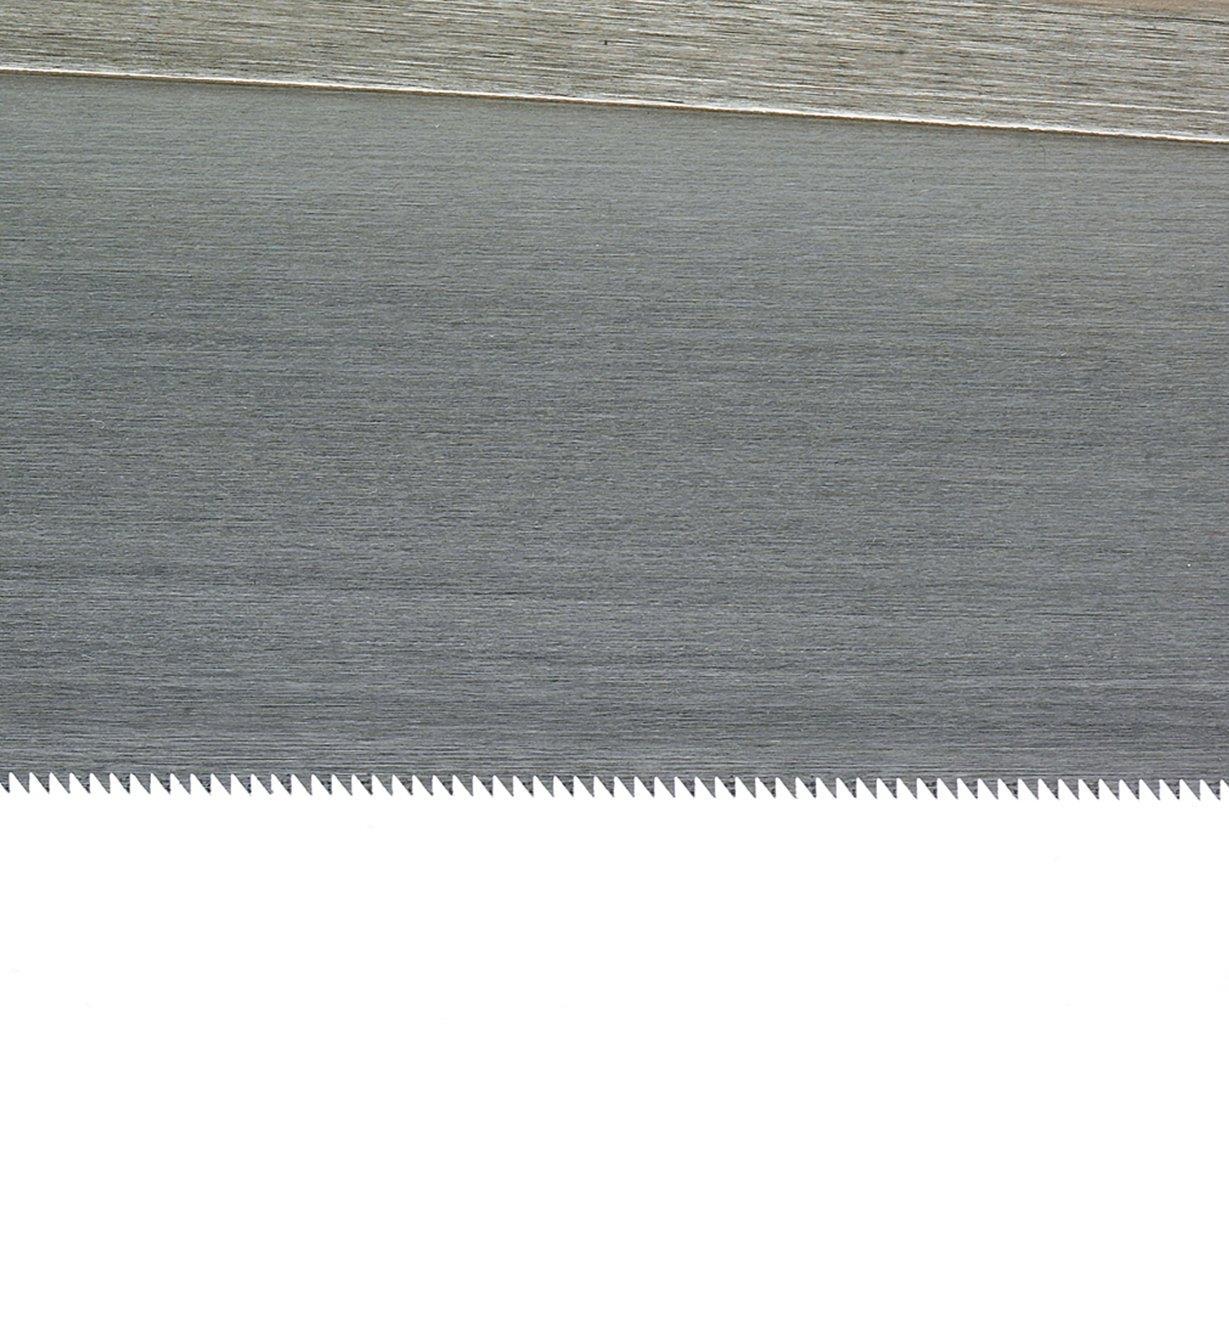 60T0404 - Japanese Rip-Tooth Dozuki